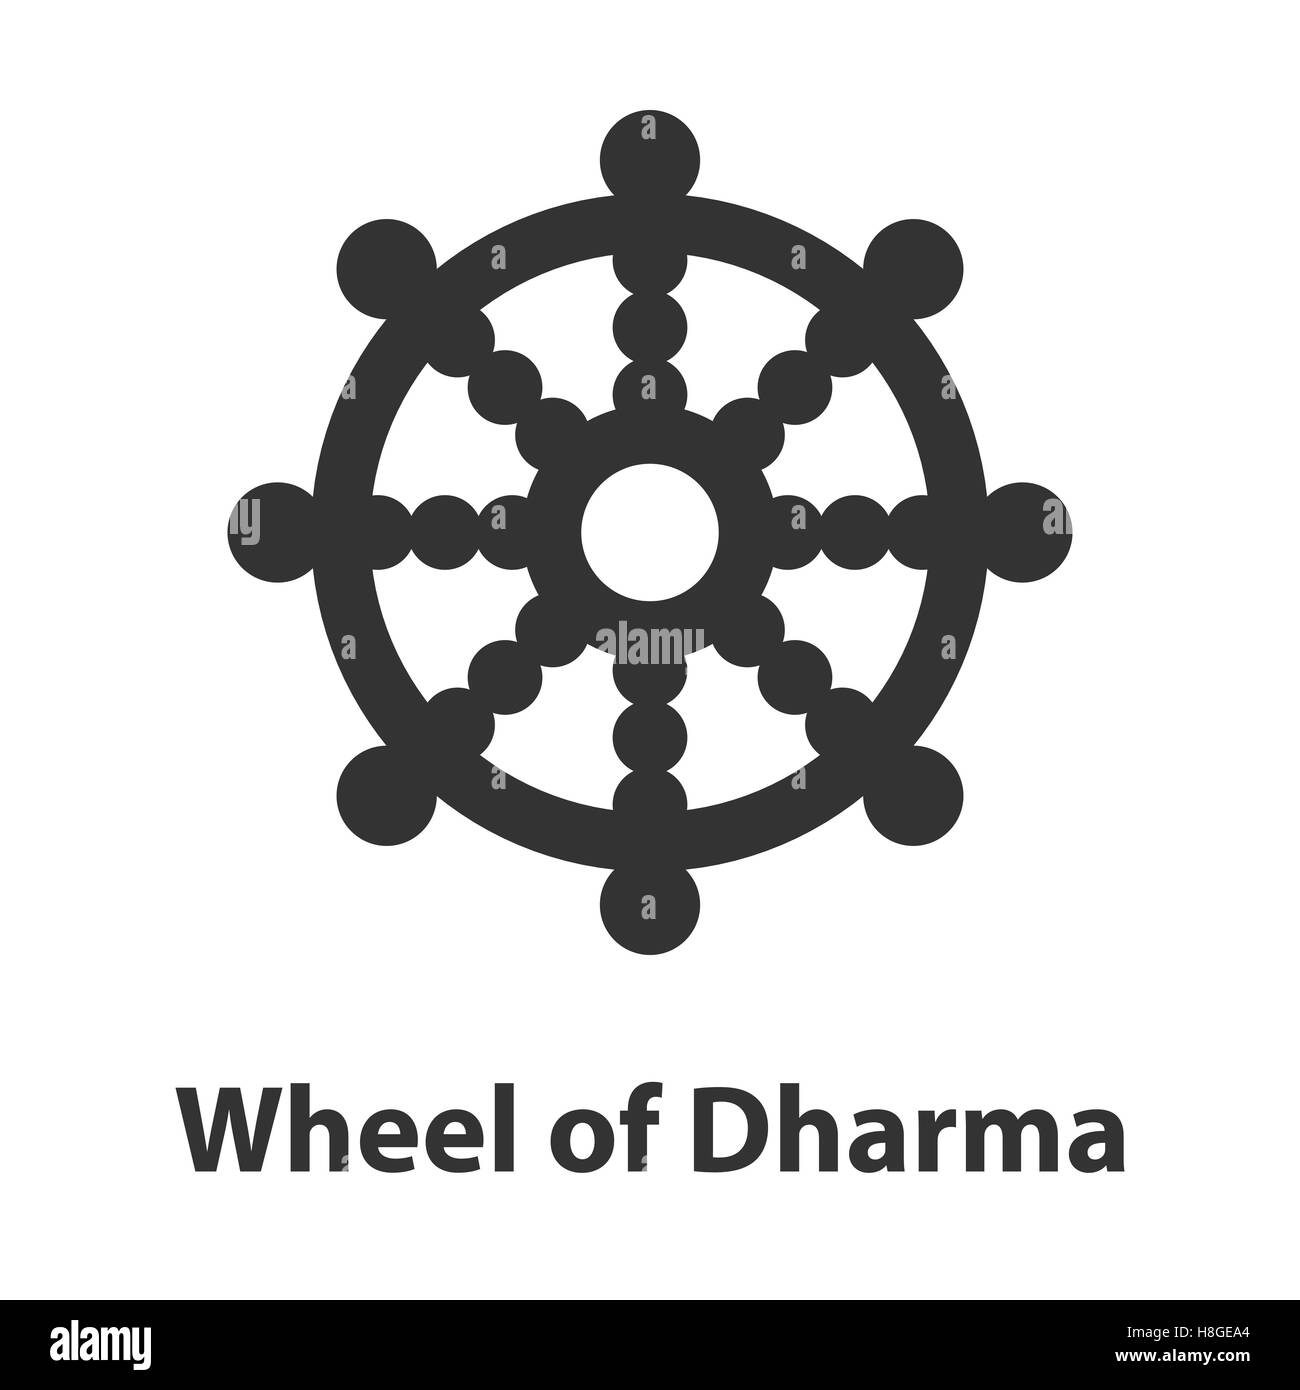 Dharma chakra stock photos dharma chakra stock images alamy icon of wheel of dharma symbol buddhism religion sign stock image biocorpaavc Images